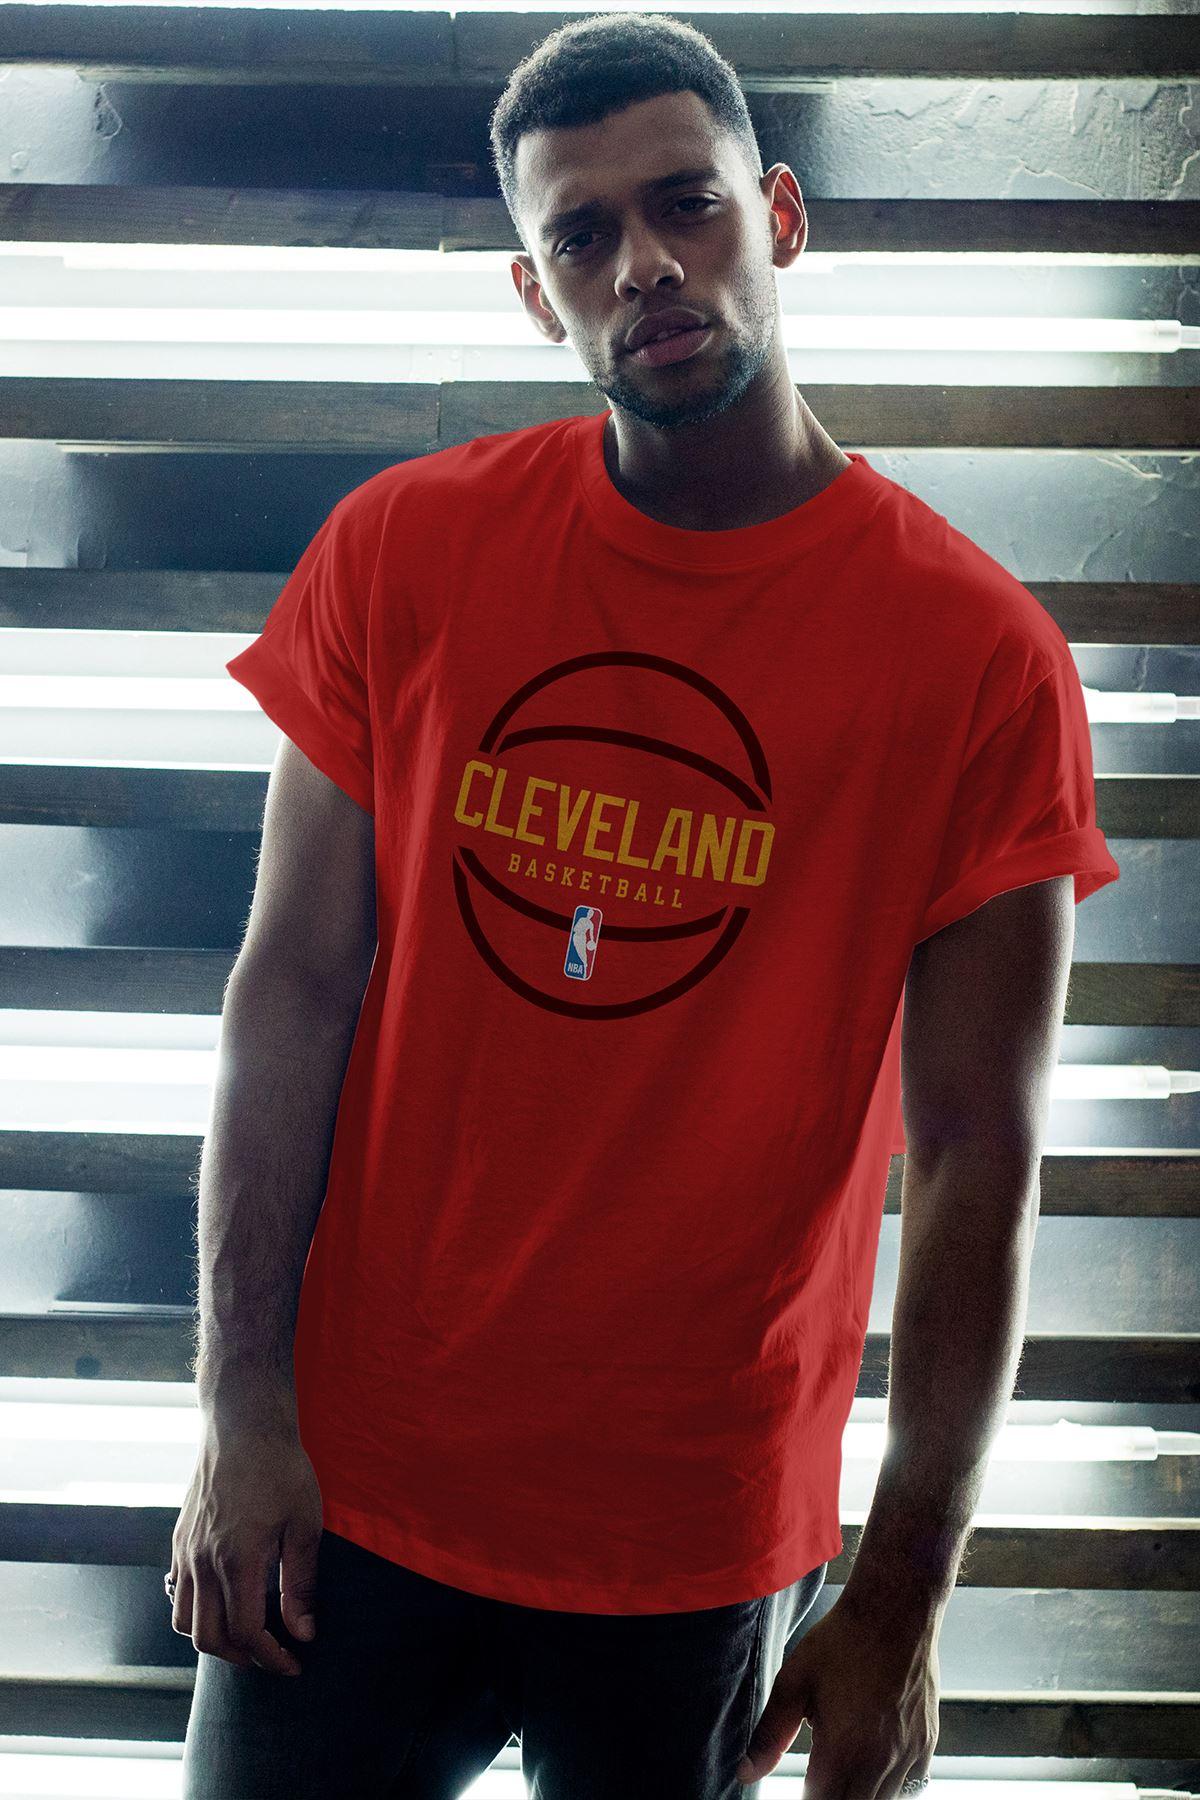 Cleveland 03 Kırmızı Erkek Oversize Tshirt - Tişört